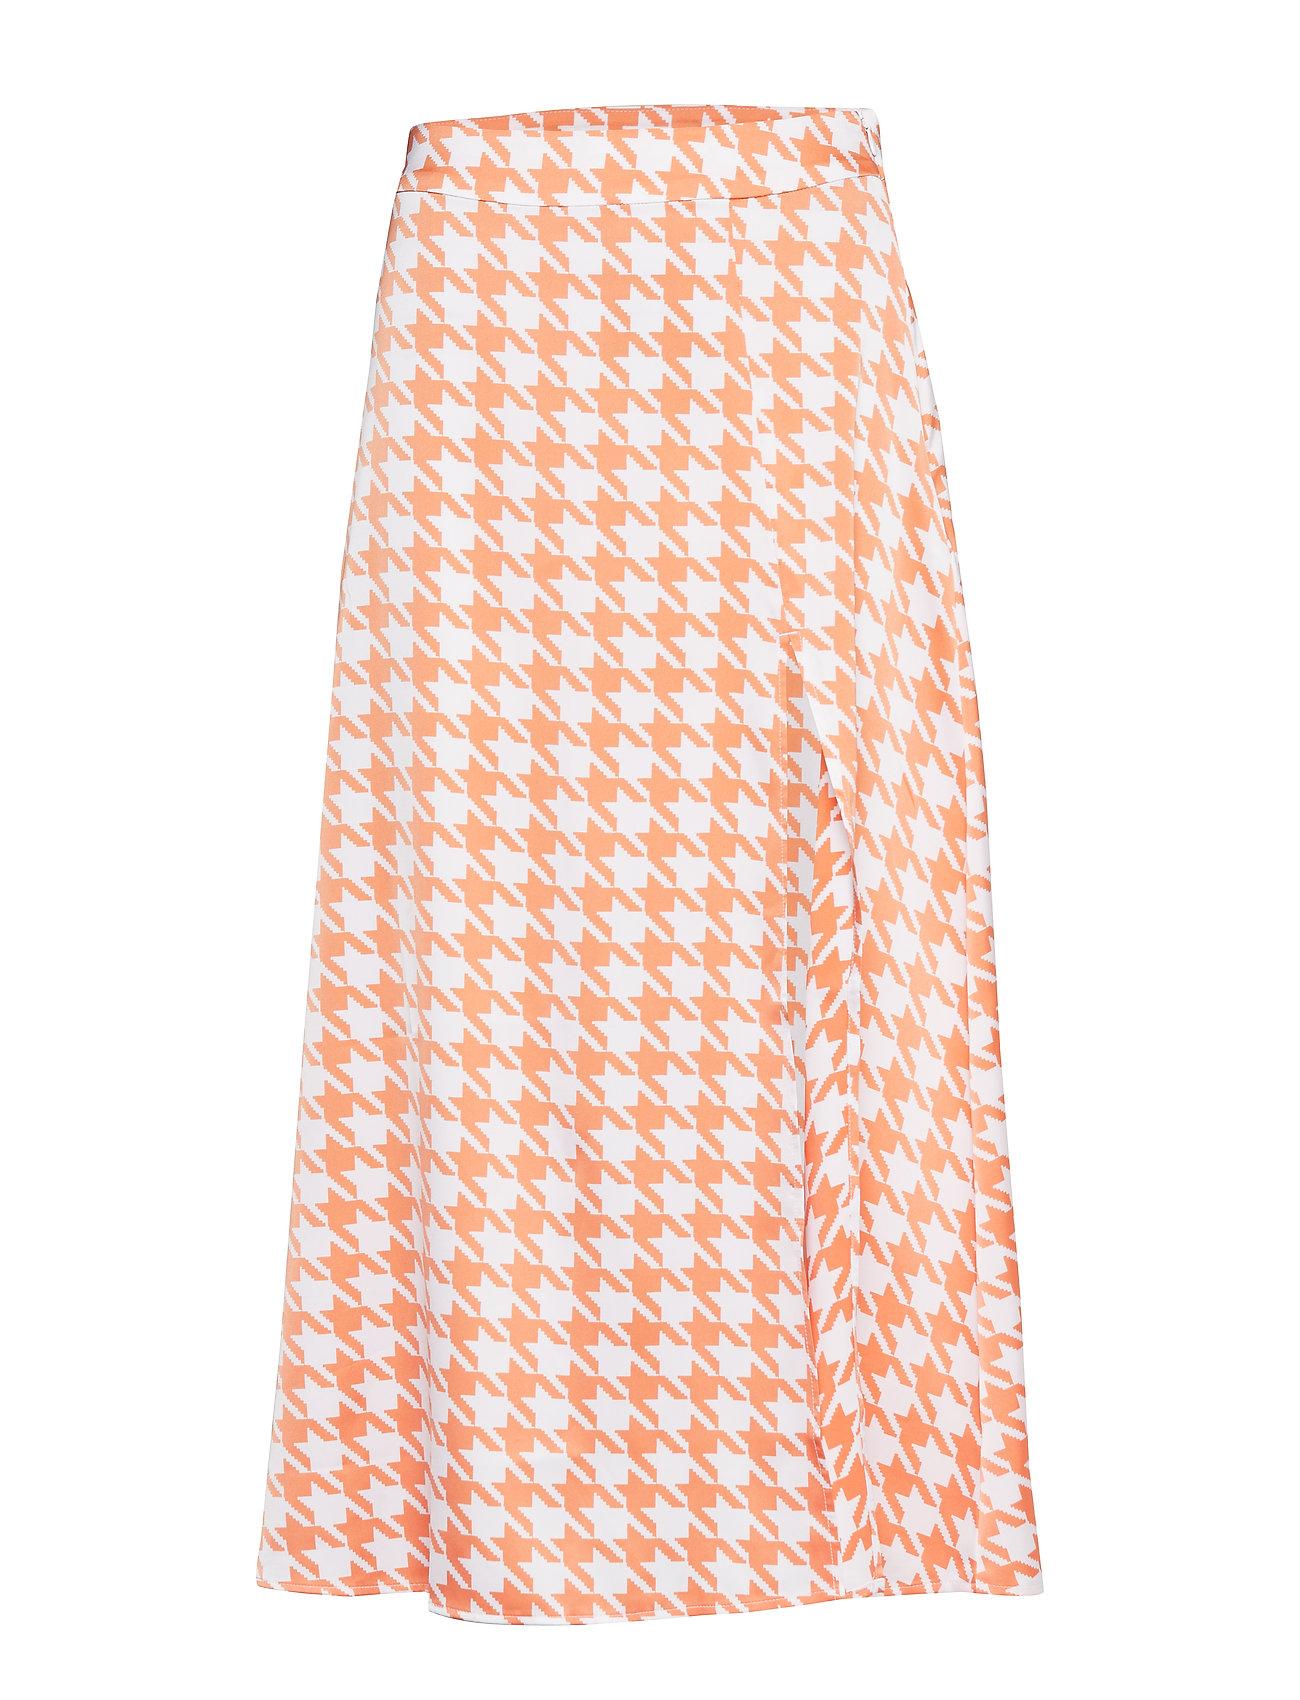 Ivyrevel Split Skirt - ORANGE PEPITA PRINT